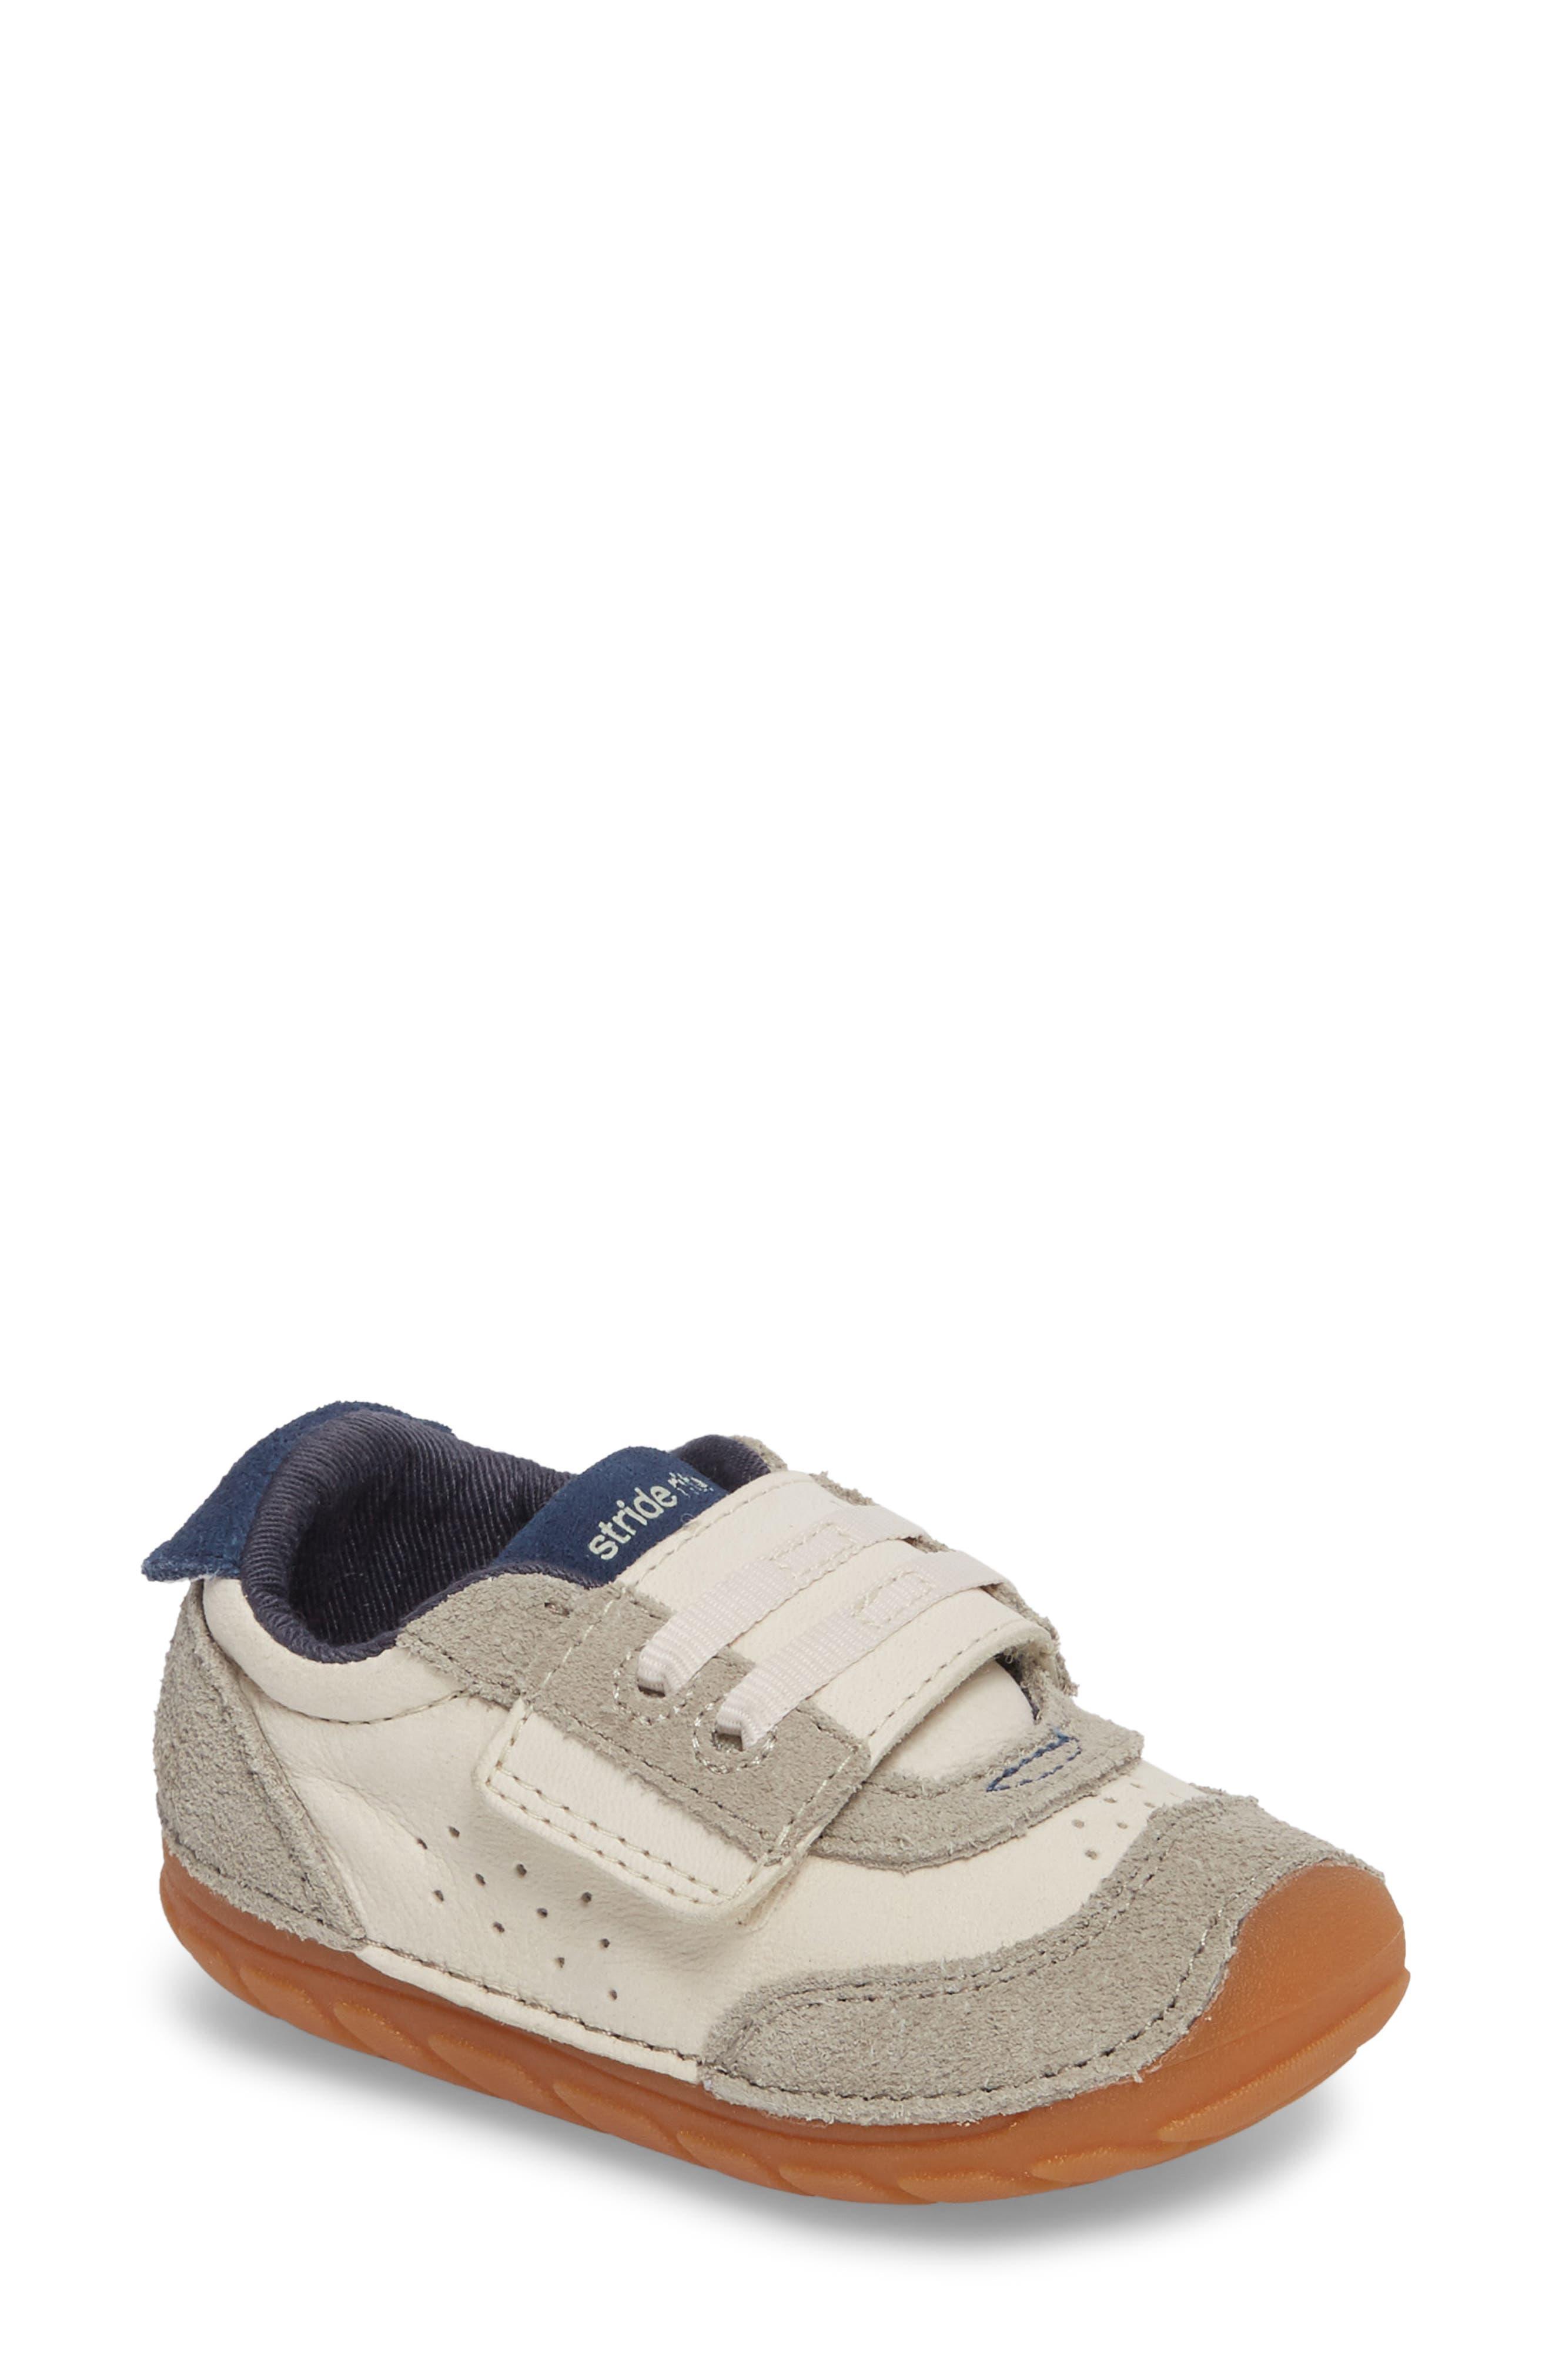 Soft Motion SRT Wyatt Sneaker,                             Main thumbnail 1, color,                             Stone Leather